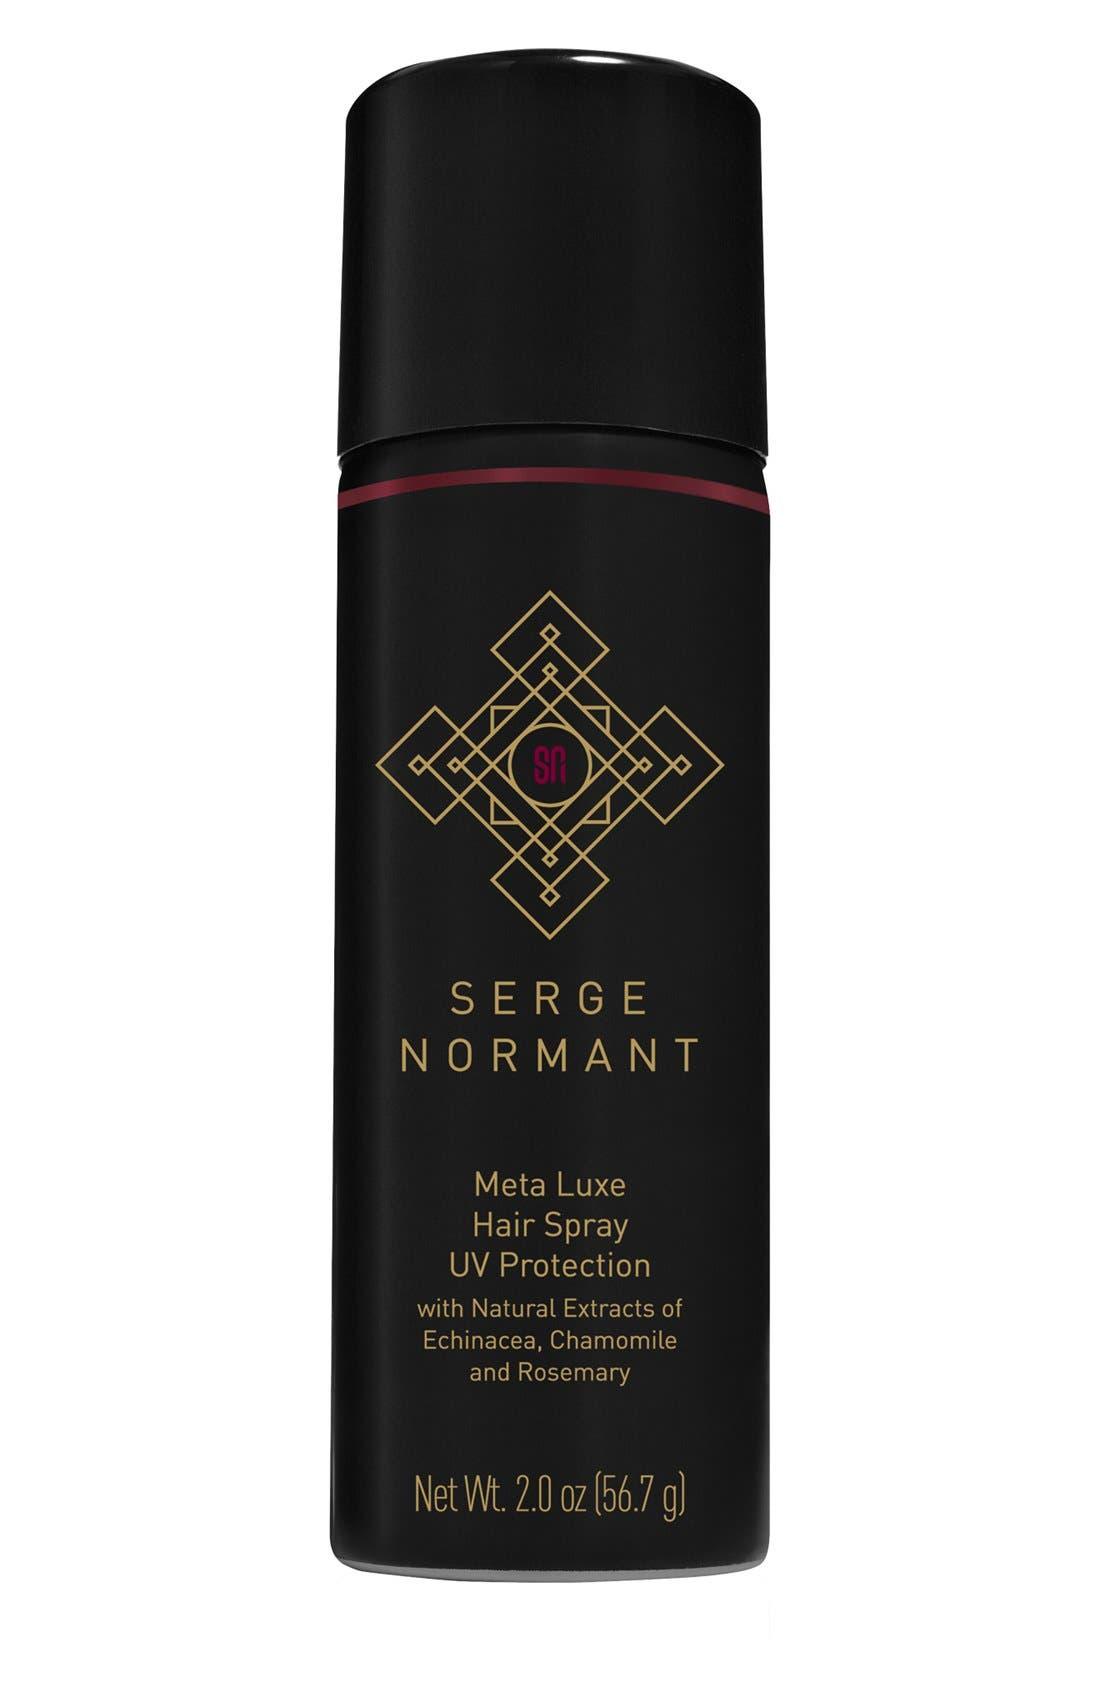 Serge Normant 'Meta Luxe' Mini Hairspray